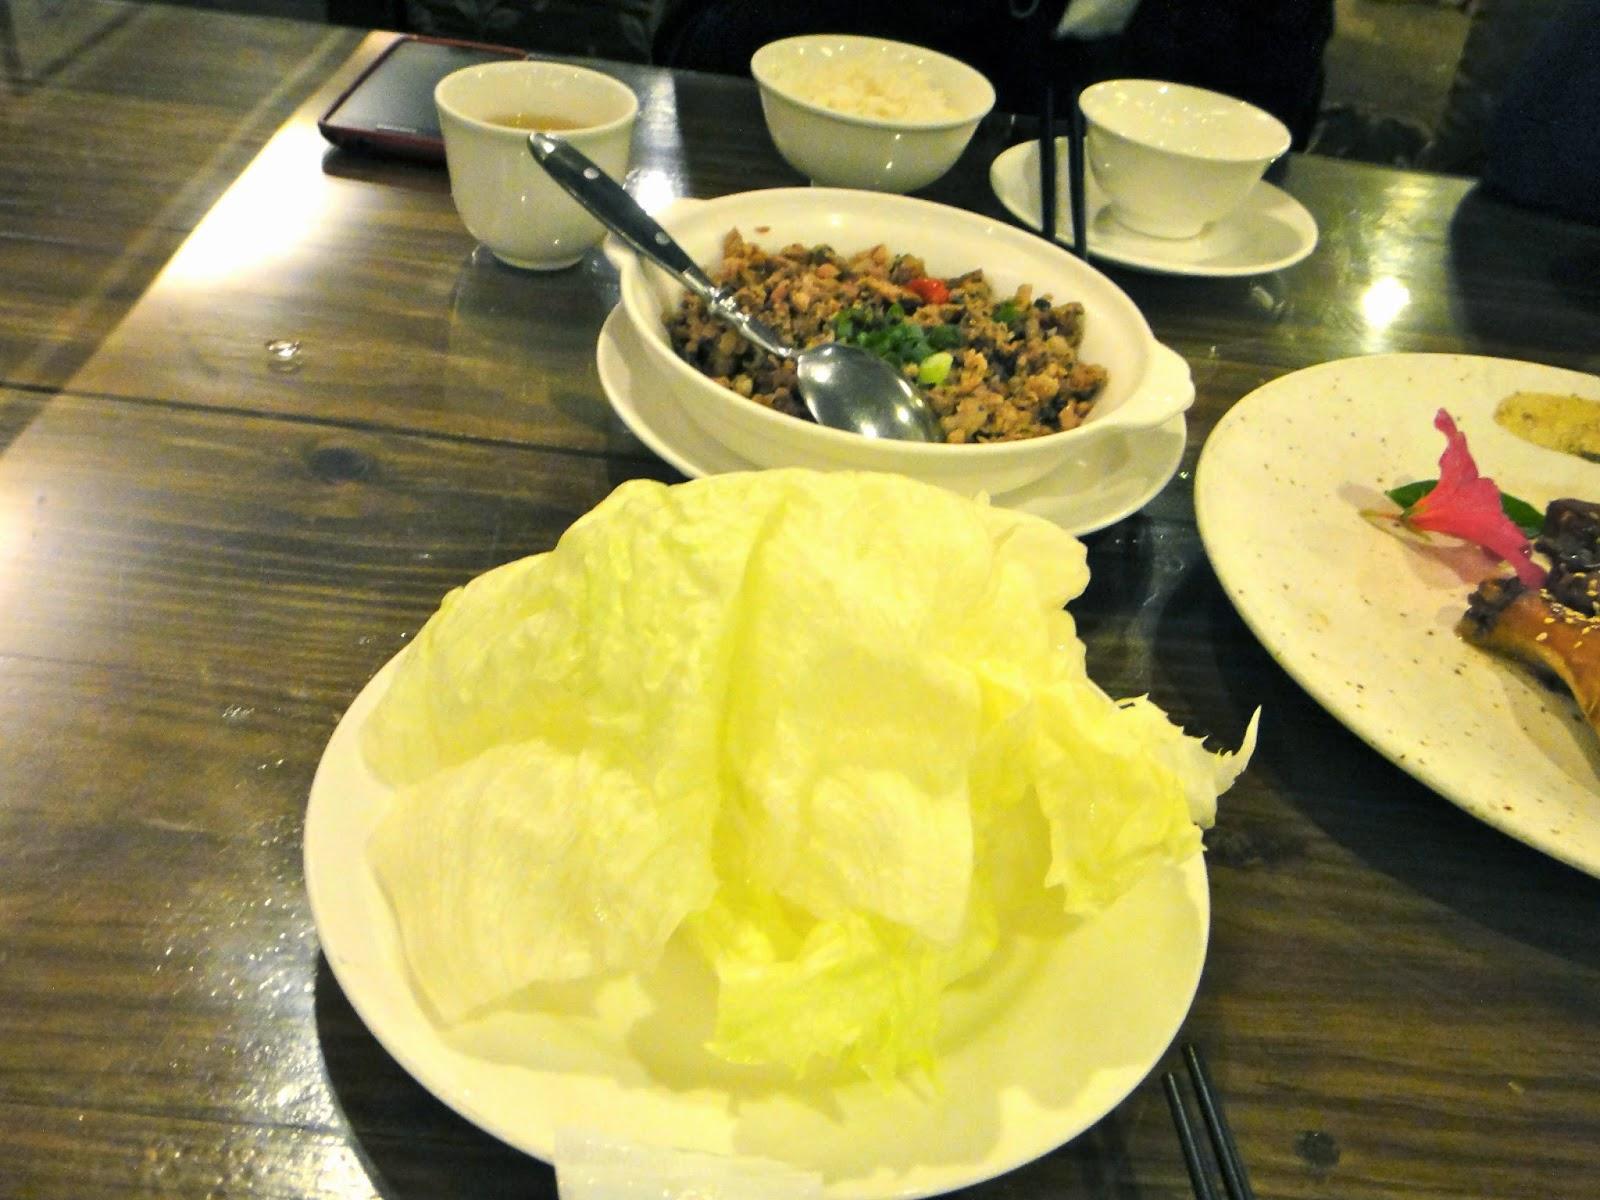 Misty Villa Cabbage and Minced Pork Dinner